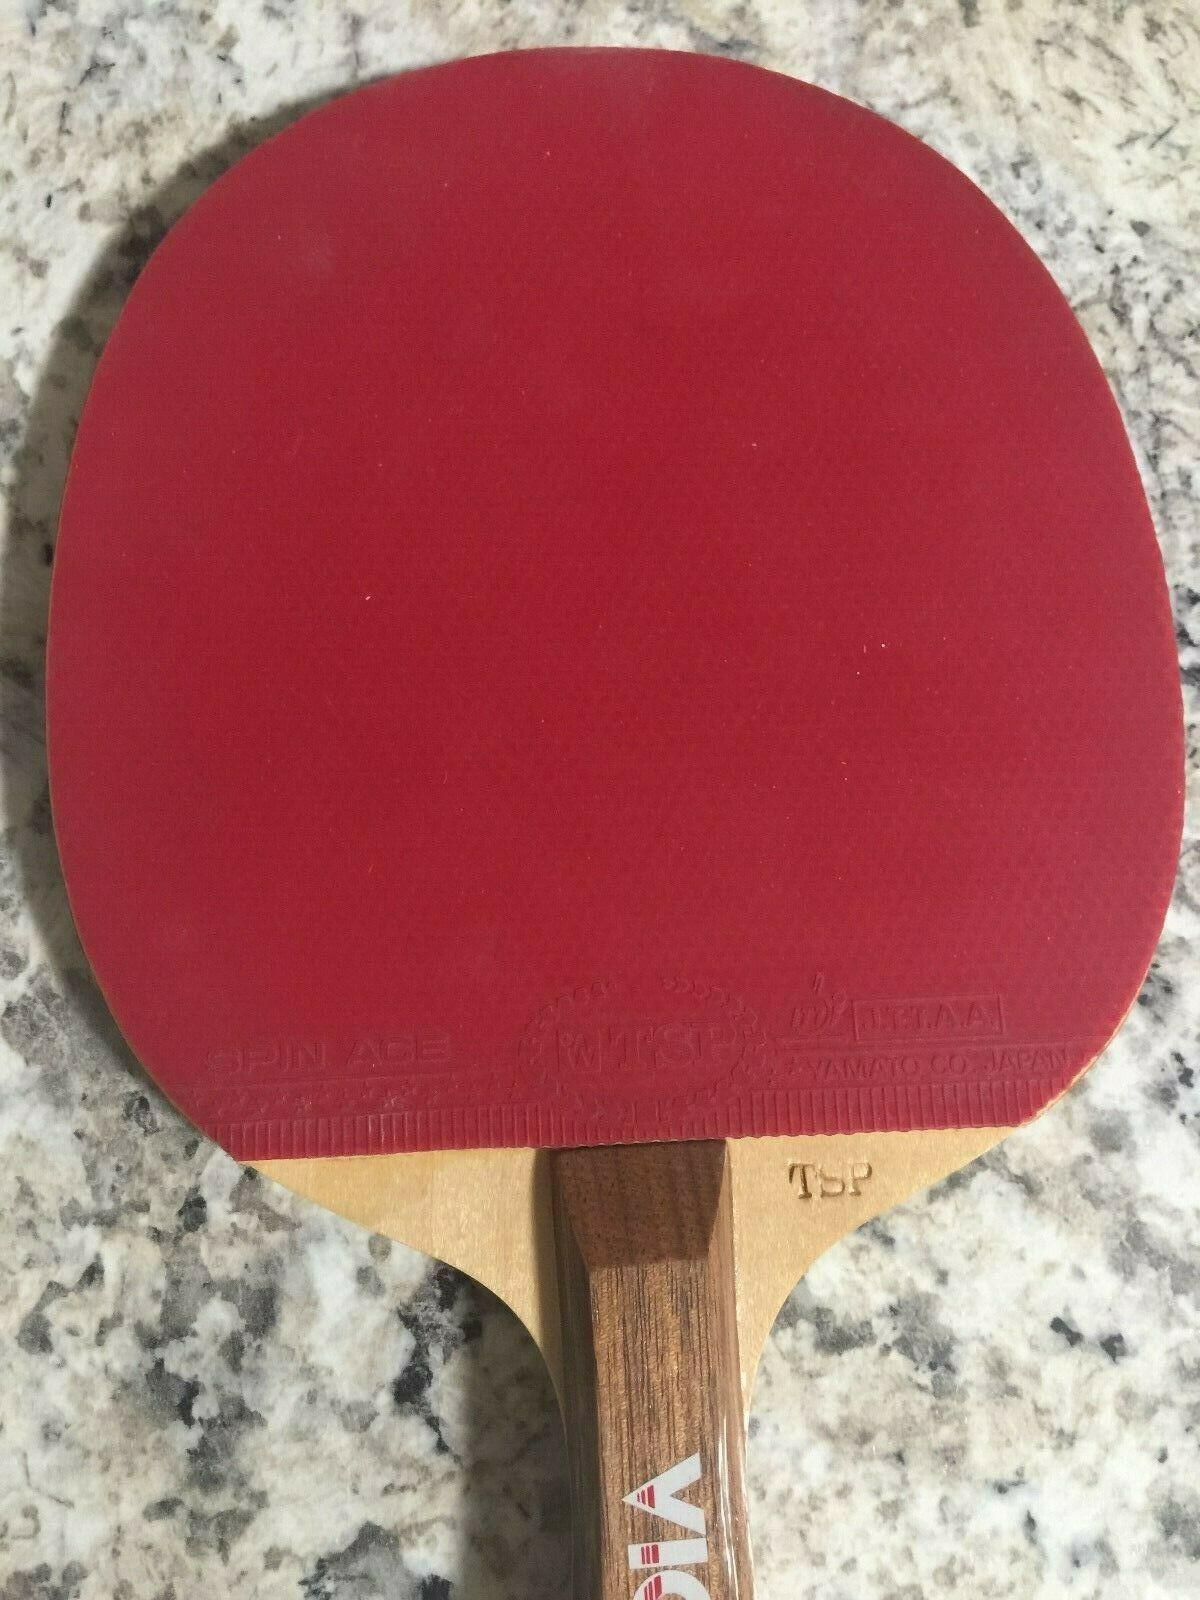 36834 ST Butterfly Table Tennis Racket Apollo Zia Straight